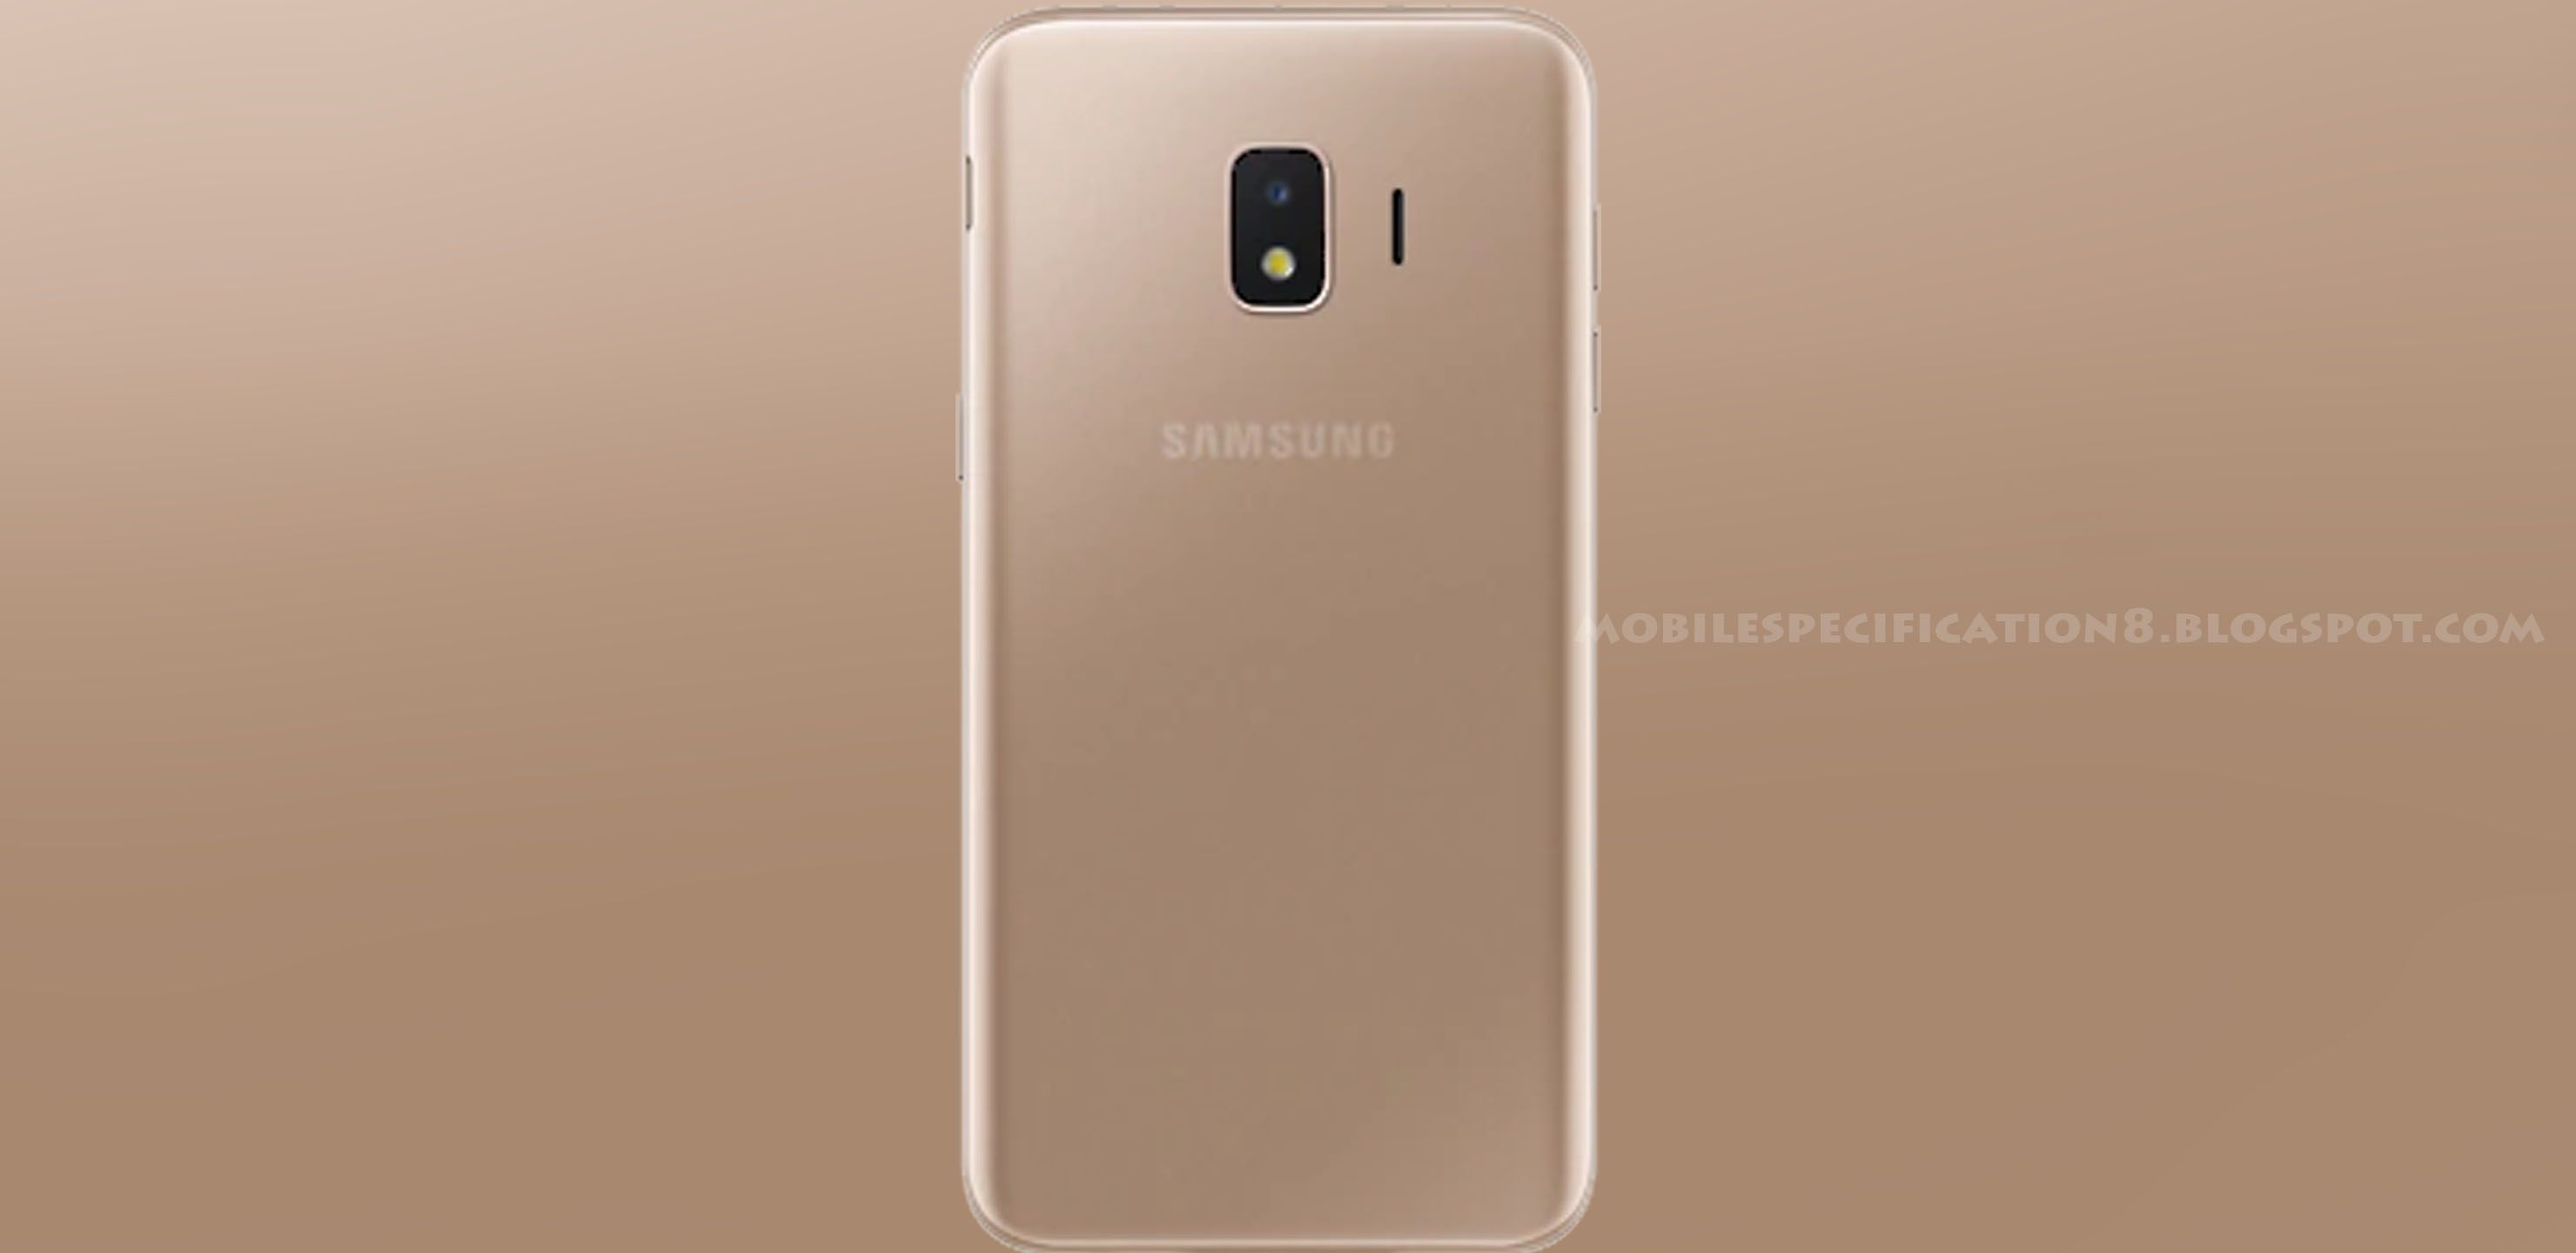 Samsung Galaxy J2 Core 2020 Gold Back Mobilespecification8 Samsung Galaxy Galaxy Samsung